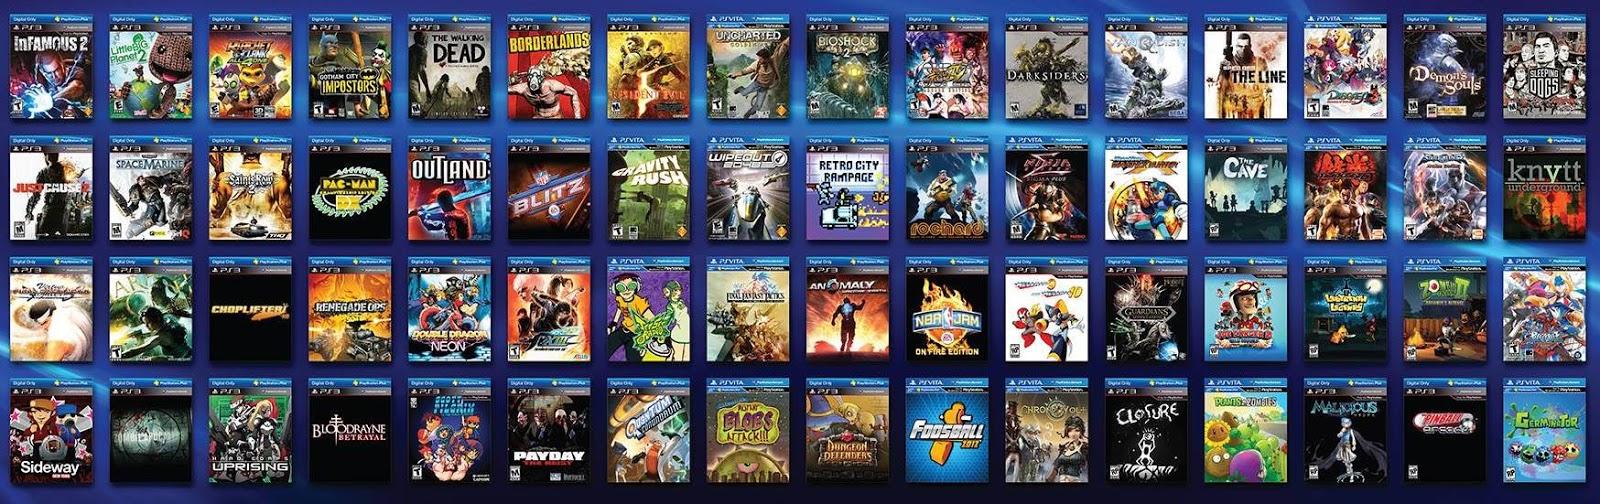 vita - Download All Sony PSVita Games